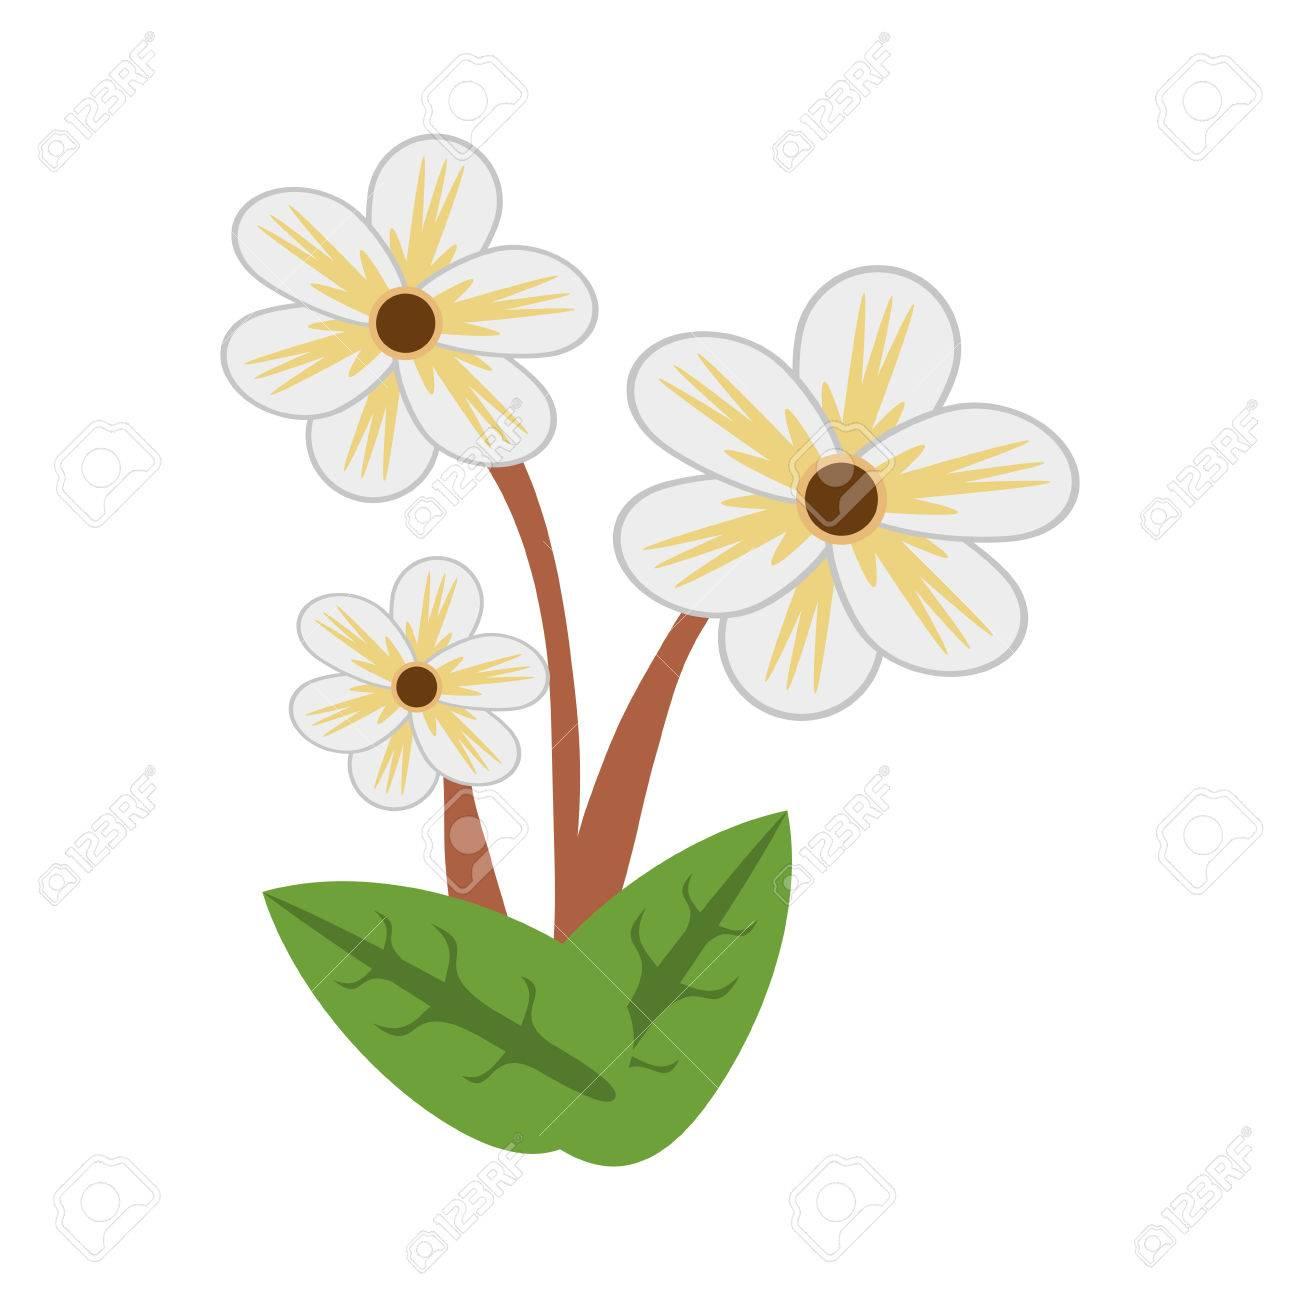 Jasmine Flower Spring Image Vector Illustration Eps 10 Royalty Free